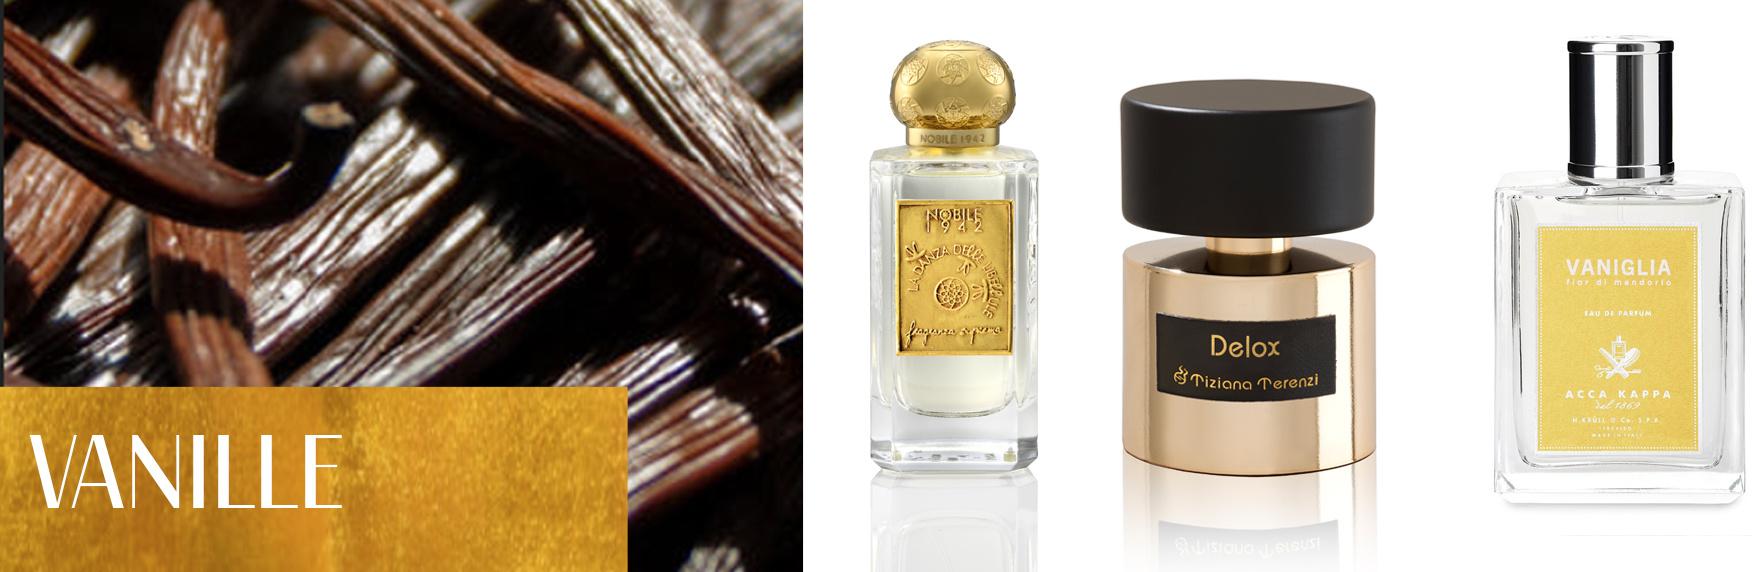 Parfum Ingrediënten: Vanille